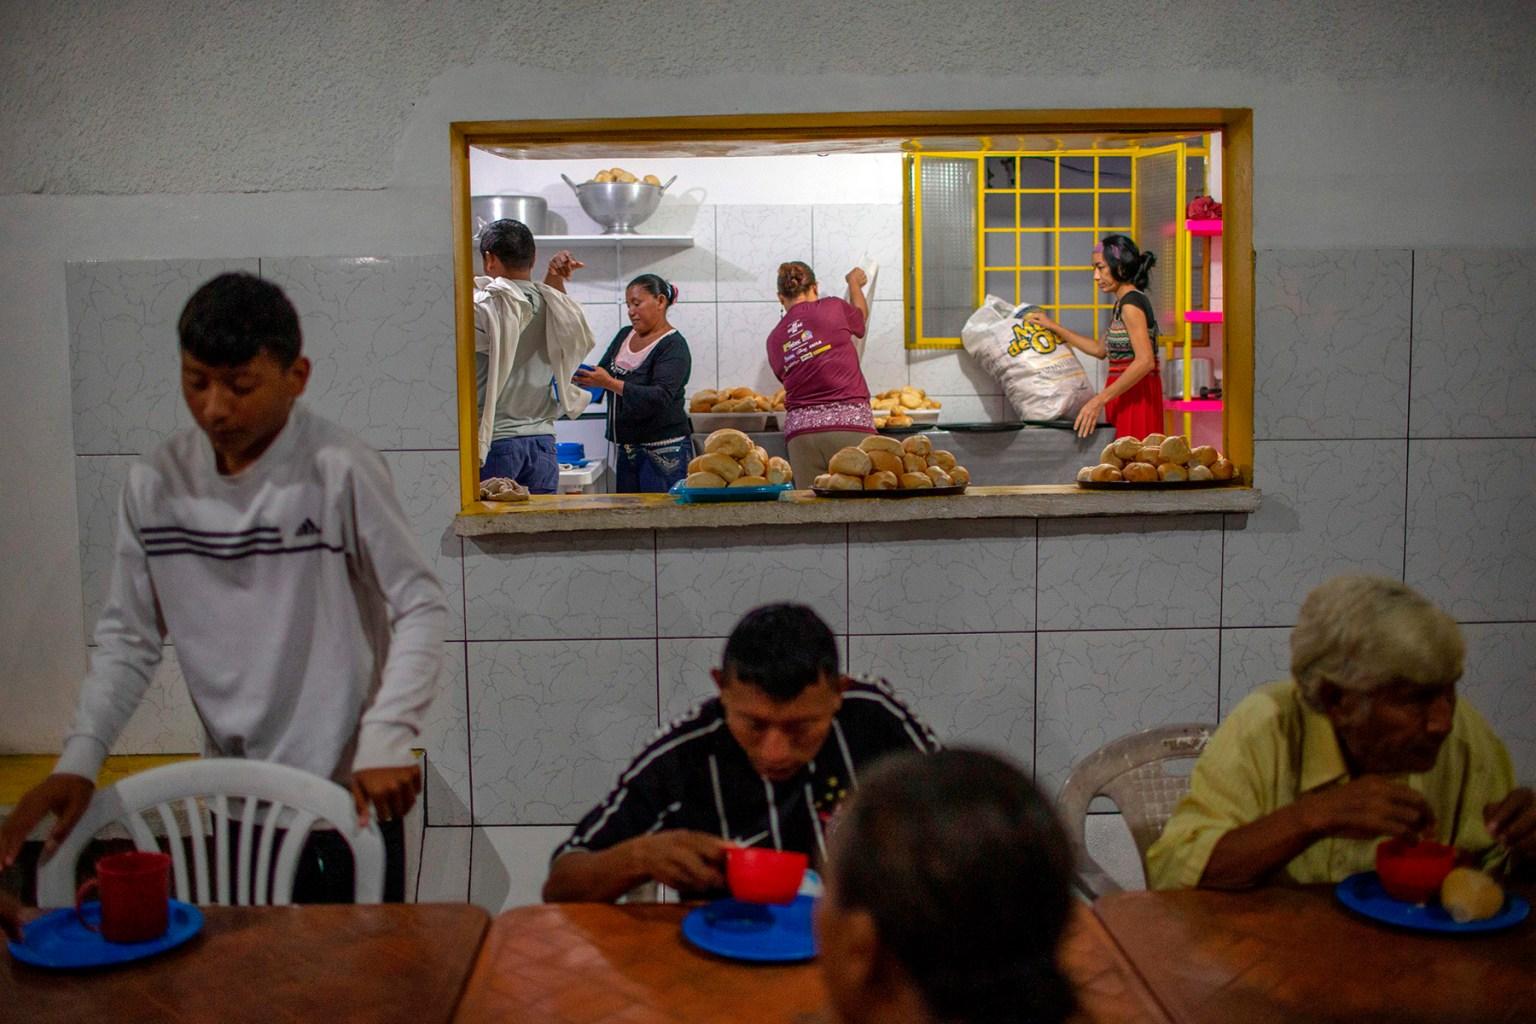 Venezuelans eat breakfast at Spanish priest Jose Lopez Fernandez de Bobadilla's parish in Pacaraima, Brazil, on Aug. 21. Venezuelans continue to cross the border despite the violent anti-migrant riot that took place last week in Pacaraima. (MAURO PIMENTEL/AFP/Getty Images)